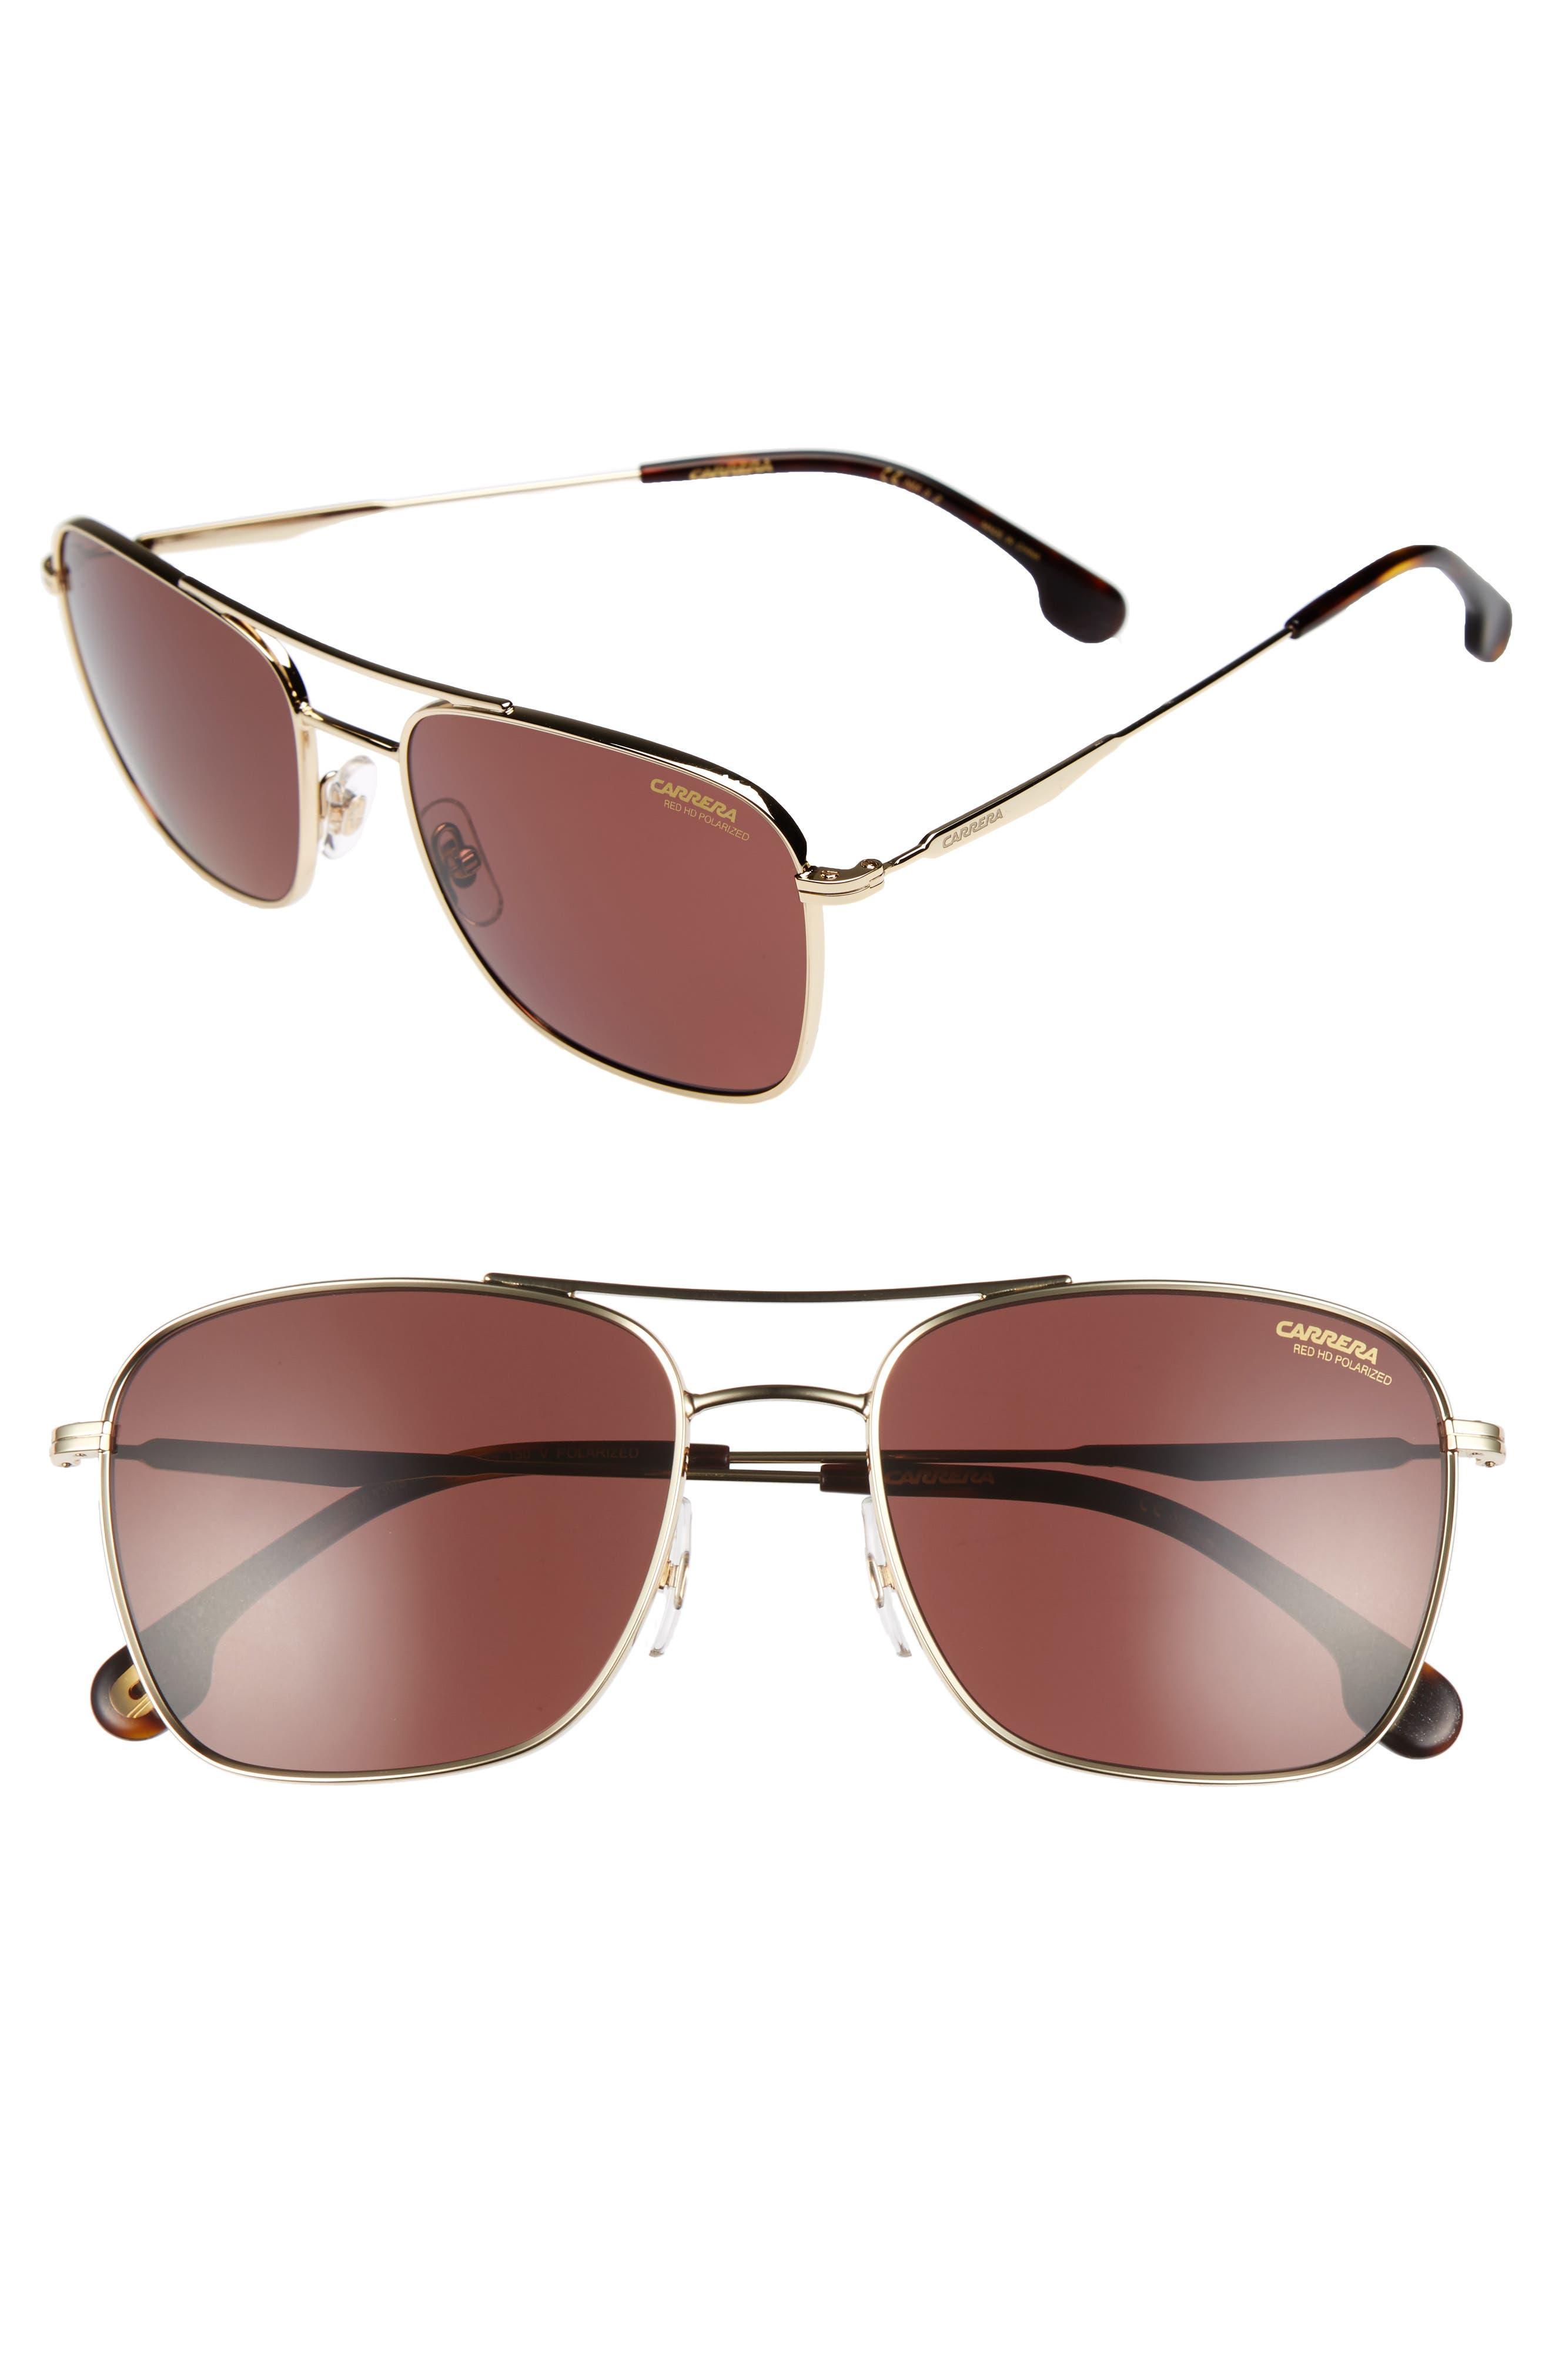 Main Image - Carrera Eyewear 58m Polarized Sunglasses